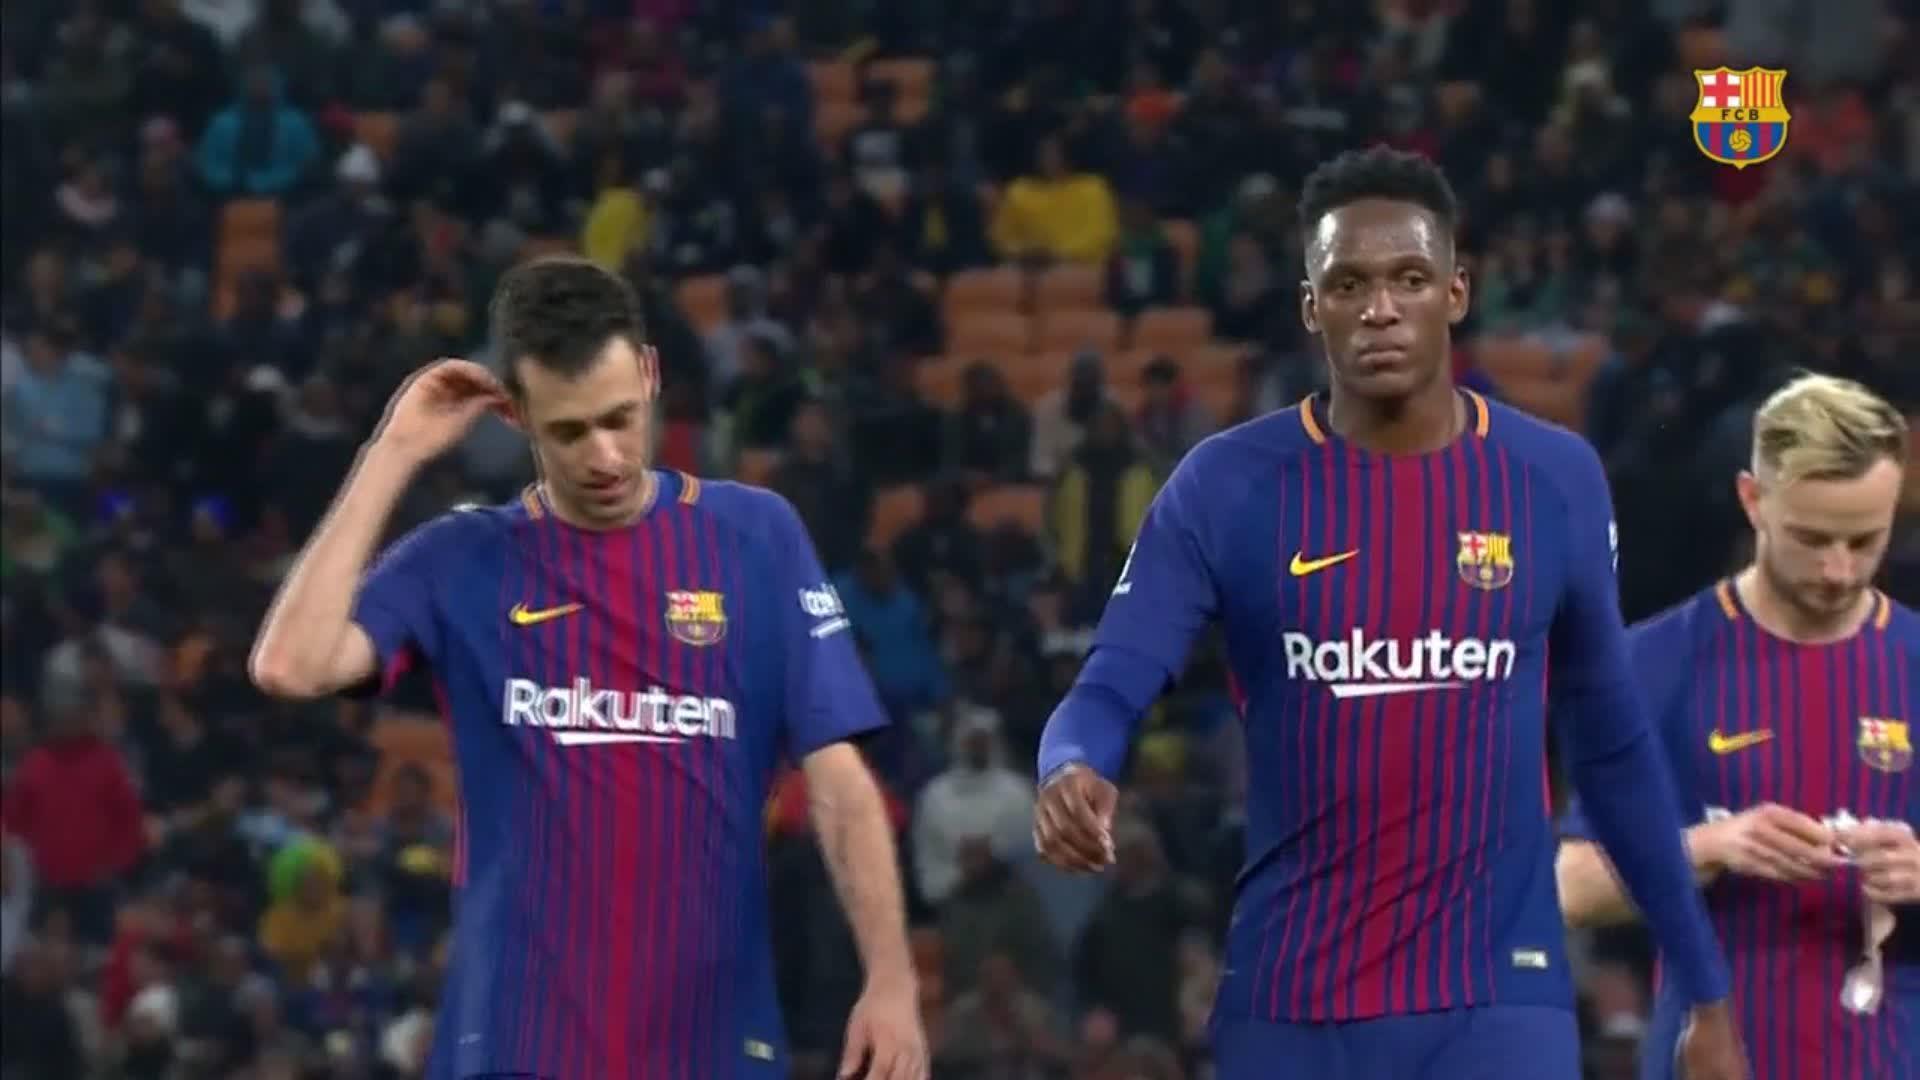 ⏰ At the break!  @Masandawana 0 @FCBarcelona 2  ⚽ O.Dembélé and Luis Suárez  #SundownsBarça https://t.co/de6zciNDW9